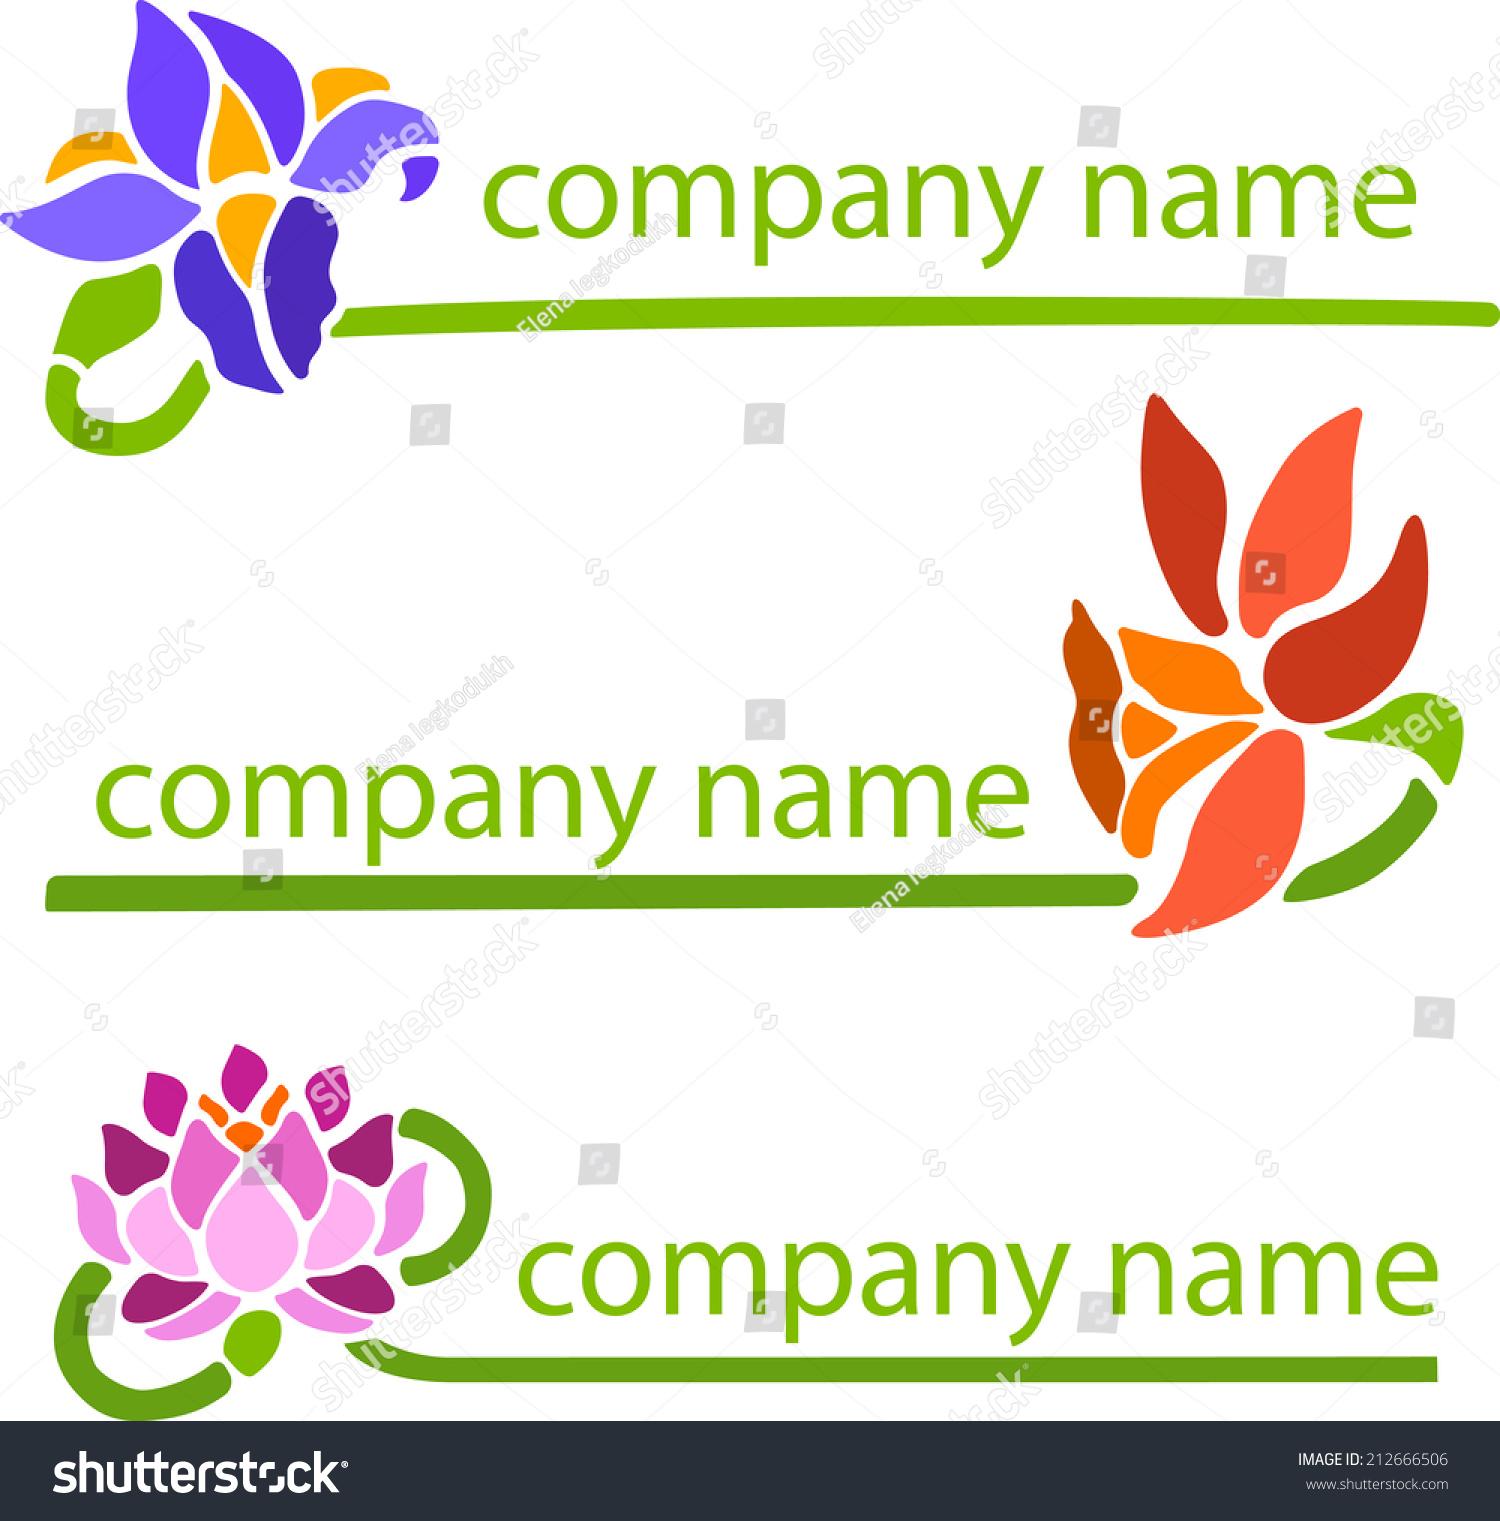 Title companies name company symbol decorative stock vector title companies name of the company symbol of decorative flowers buycottarizona